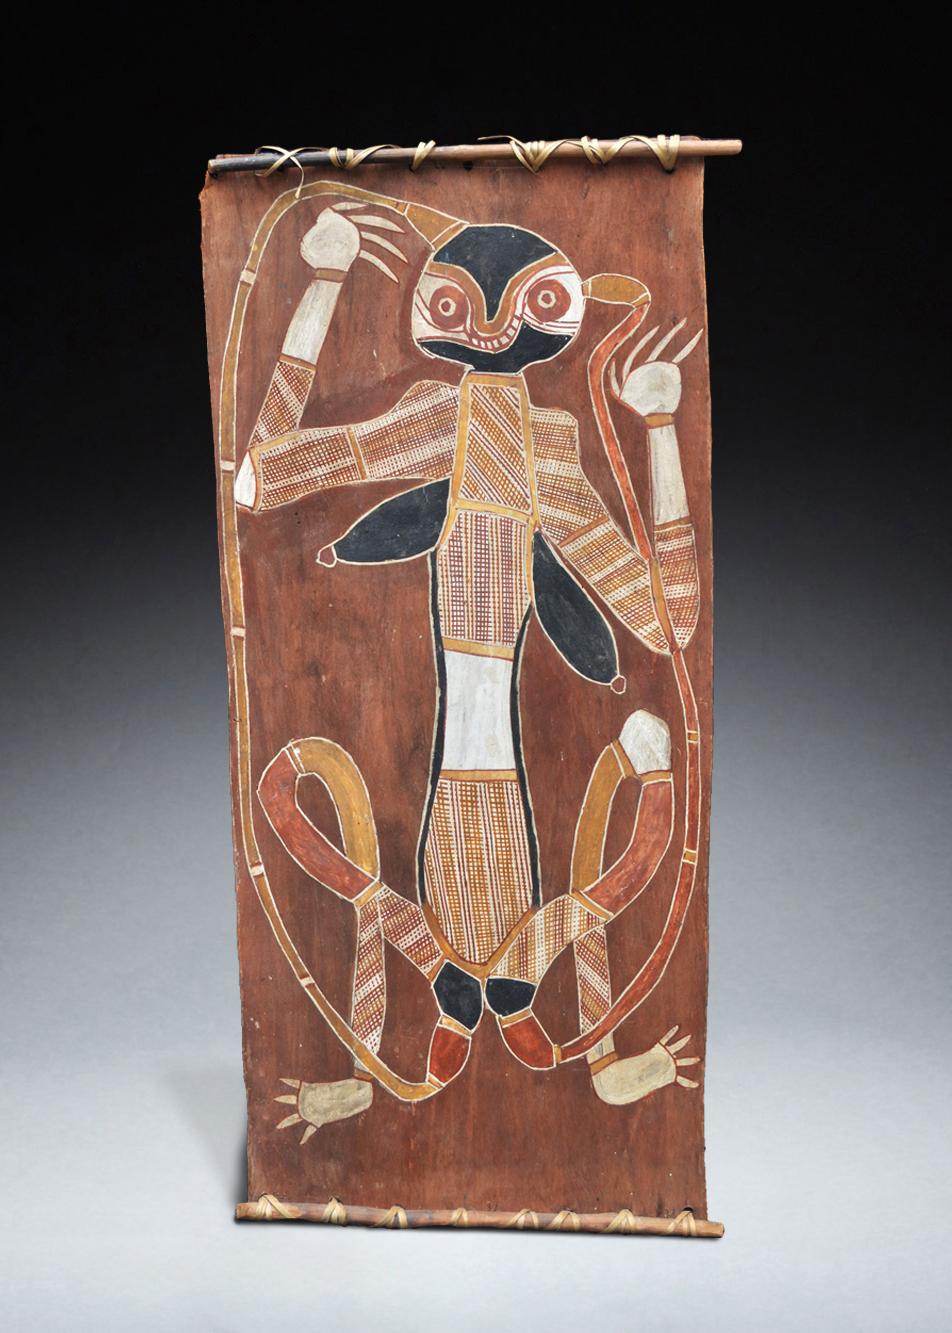 Bark Painting by George Djaykurrnga (1930-1987)